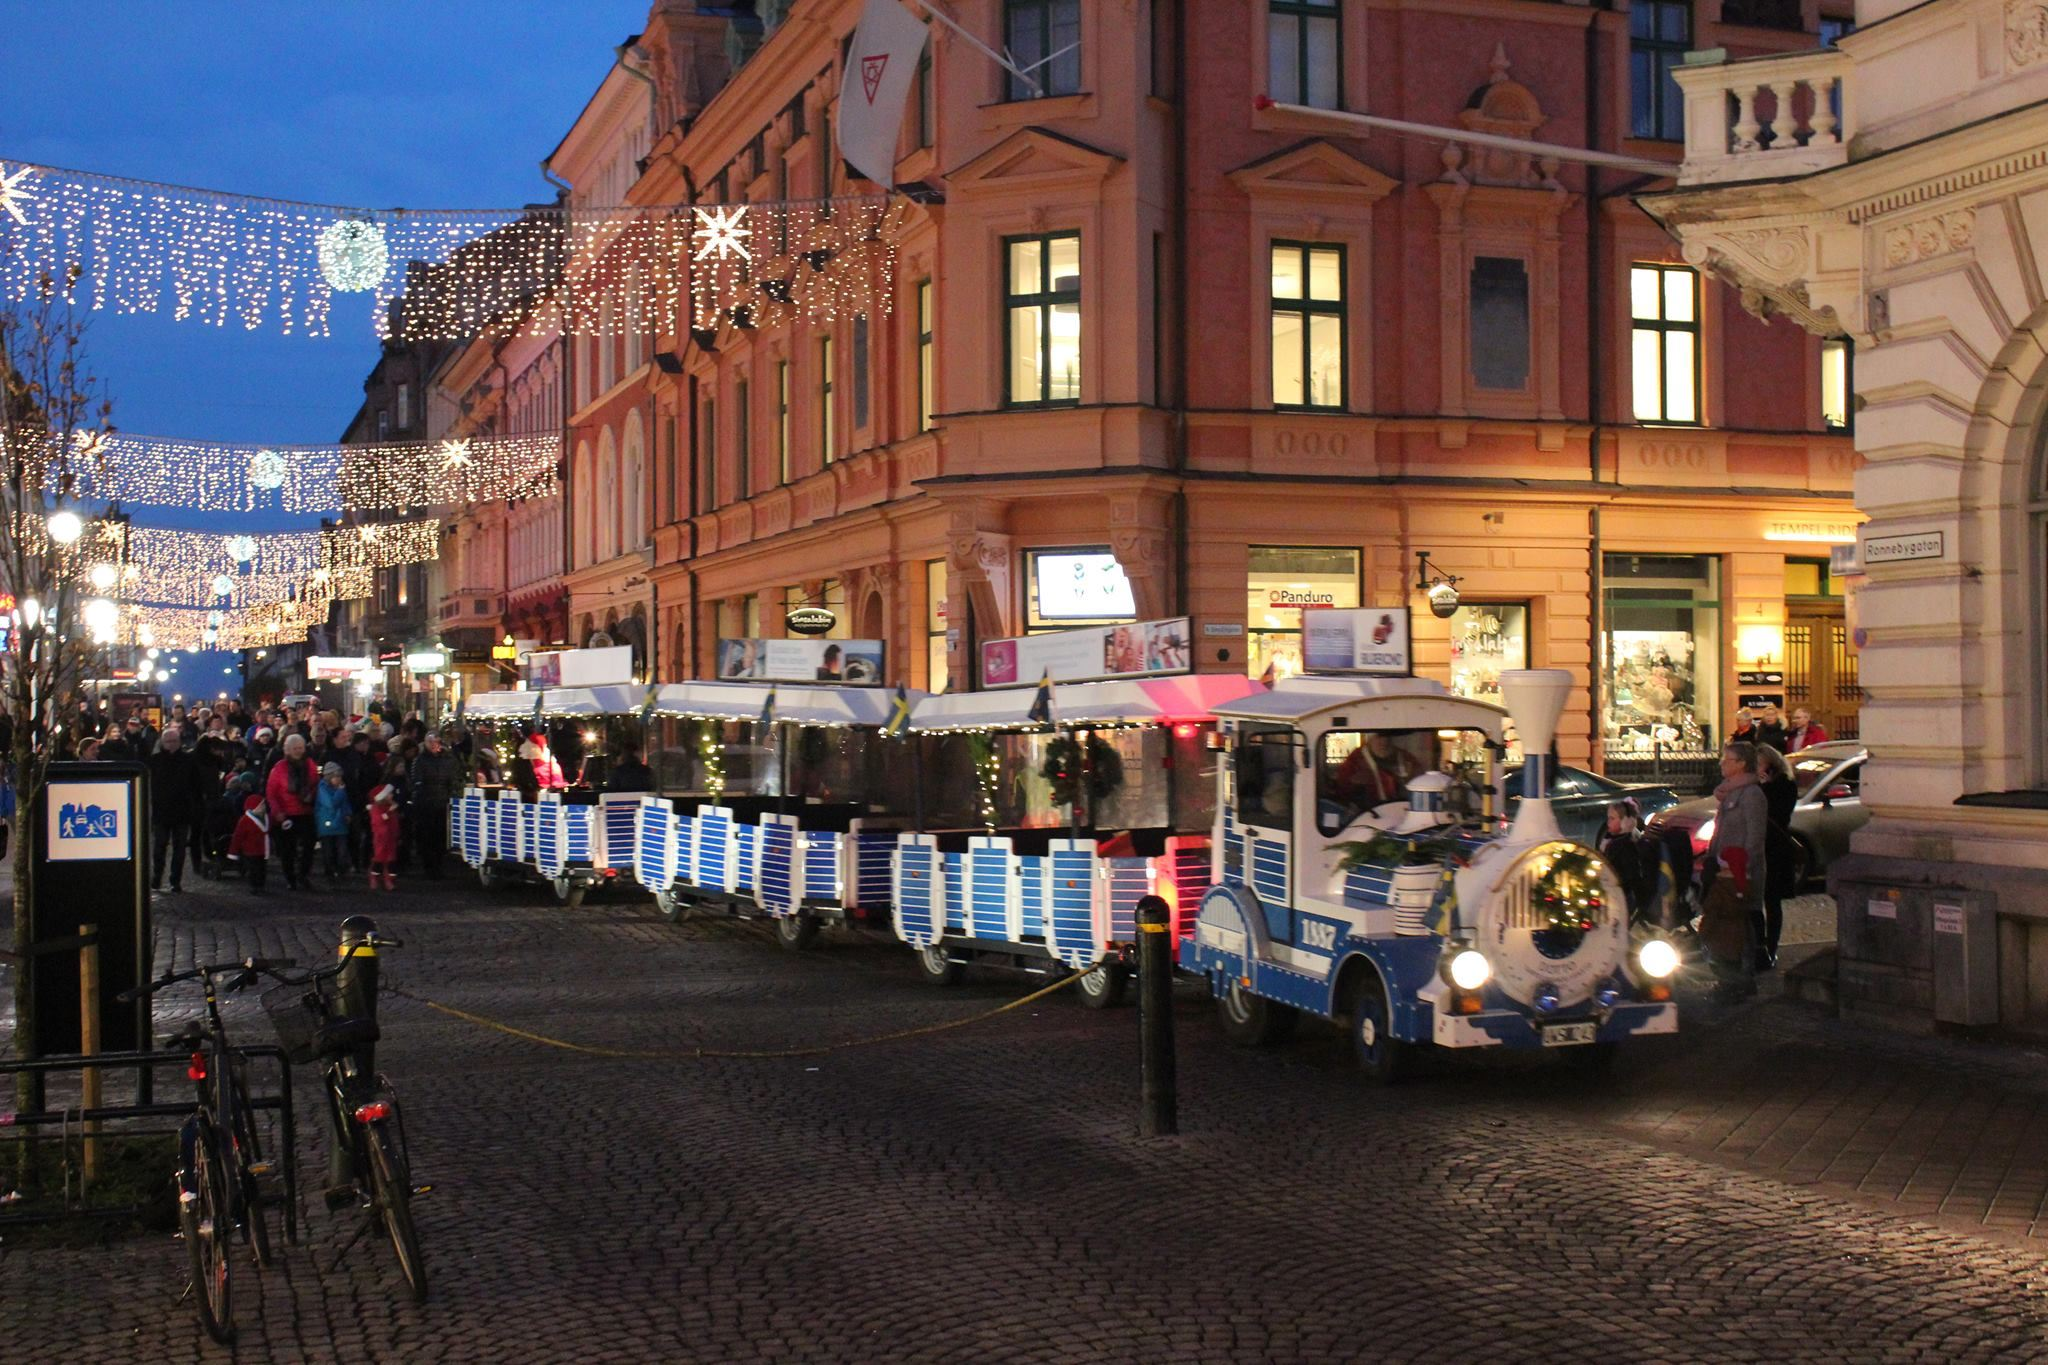 Julparad i Karlskrona City 2018